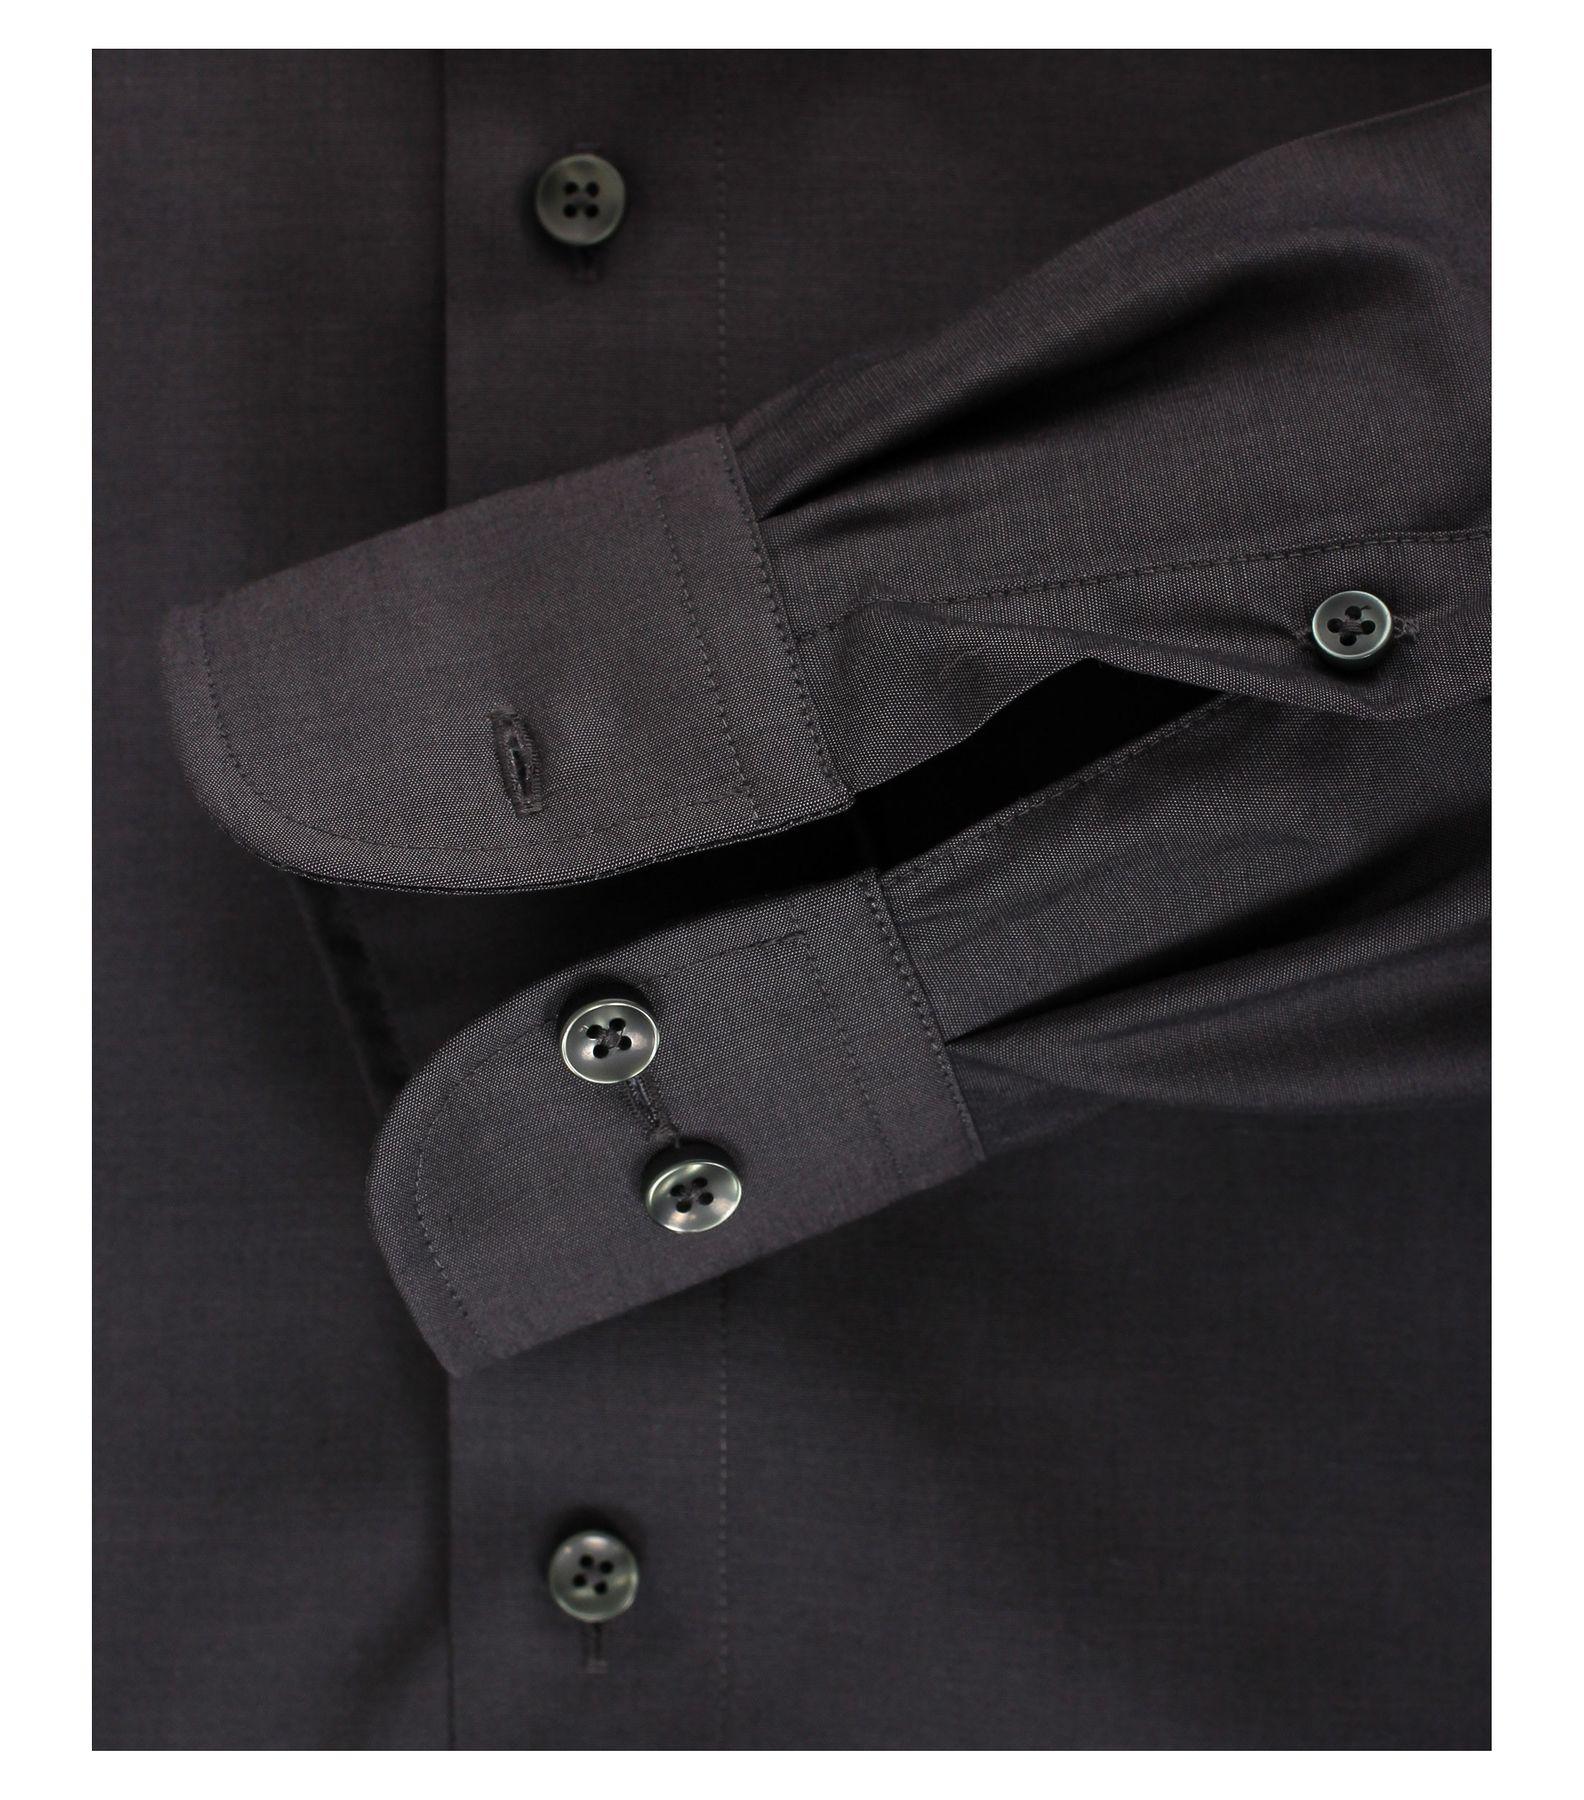 Casamoda - Modern Fit - Bügelfreies Herren Business Langarm Hemd verschiedene Farben (006560A) – Bild 22